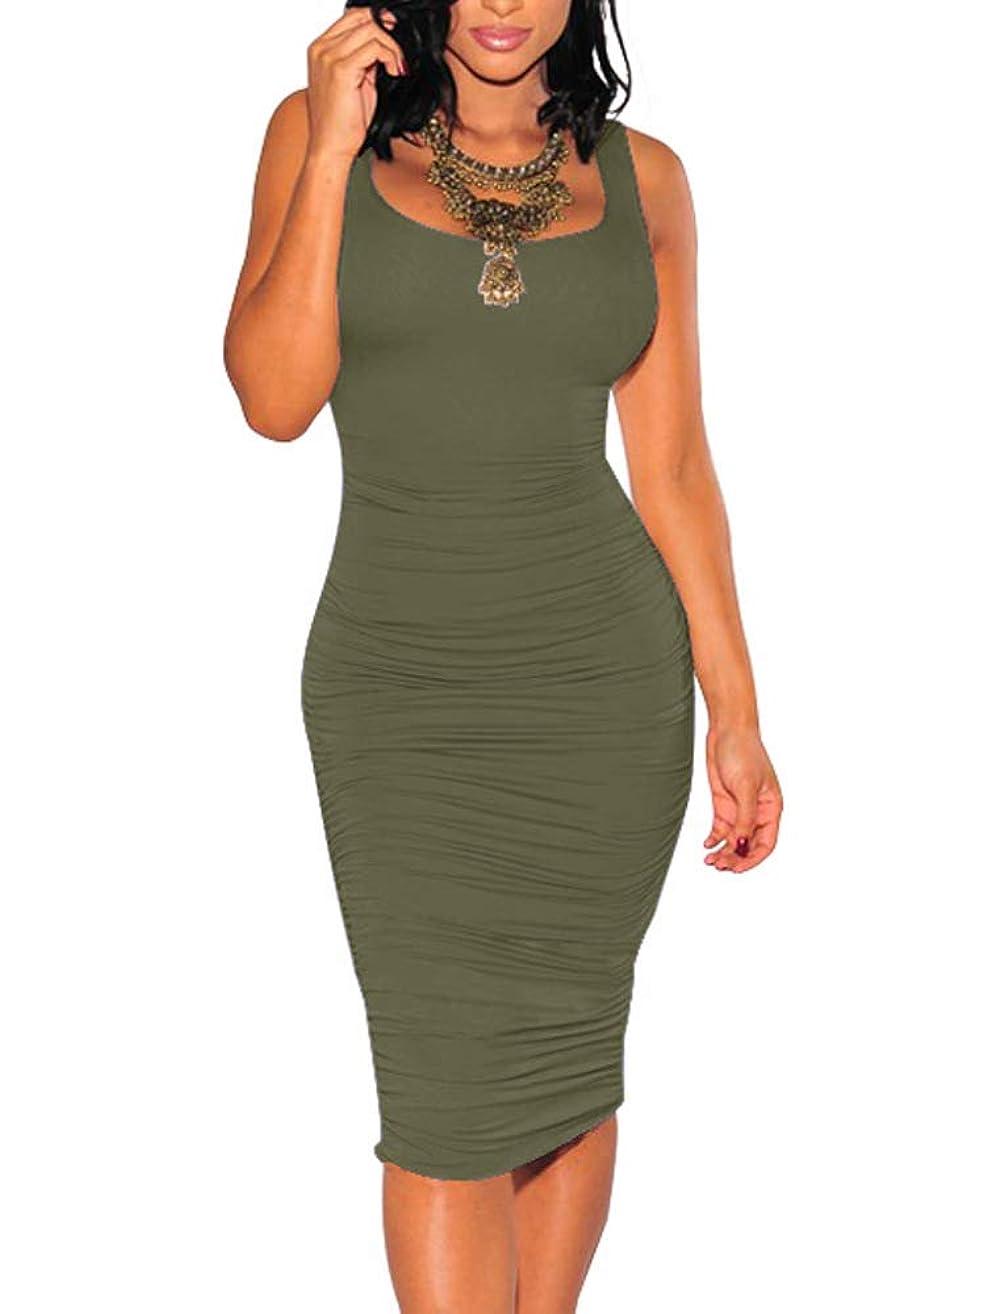 BEAGIMEG Women's Sexy Ruched Bodycon Casual Solid Sleeveless Tank Midi Dress